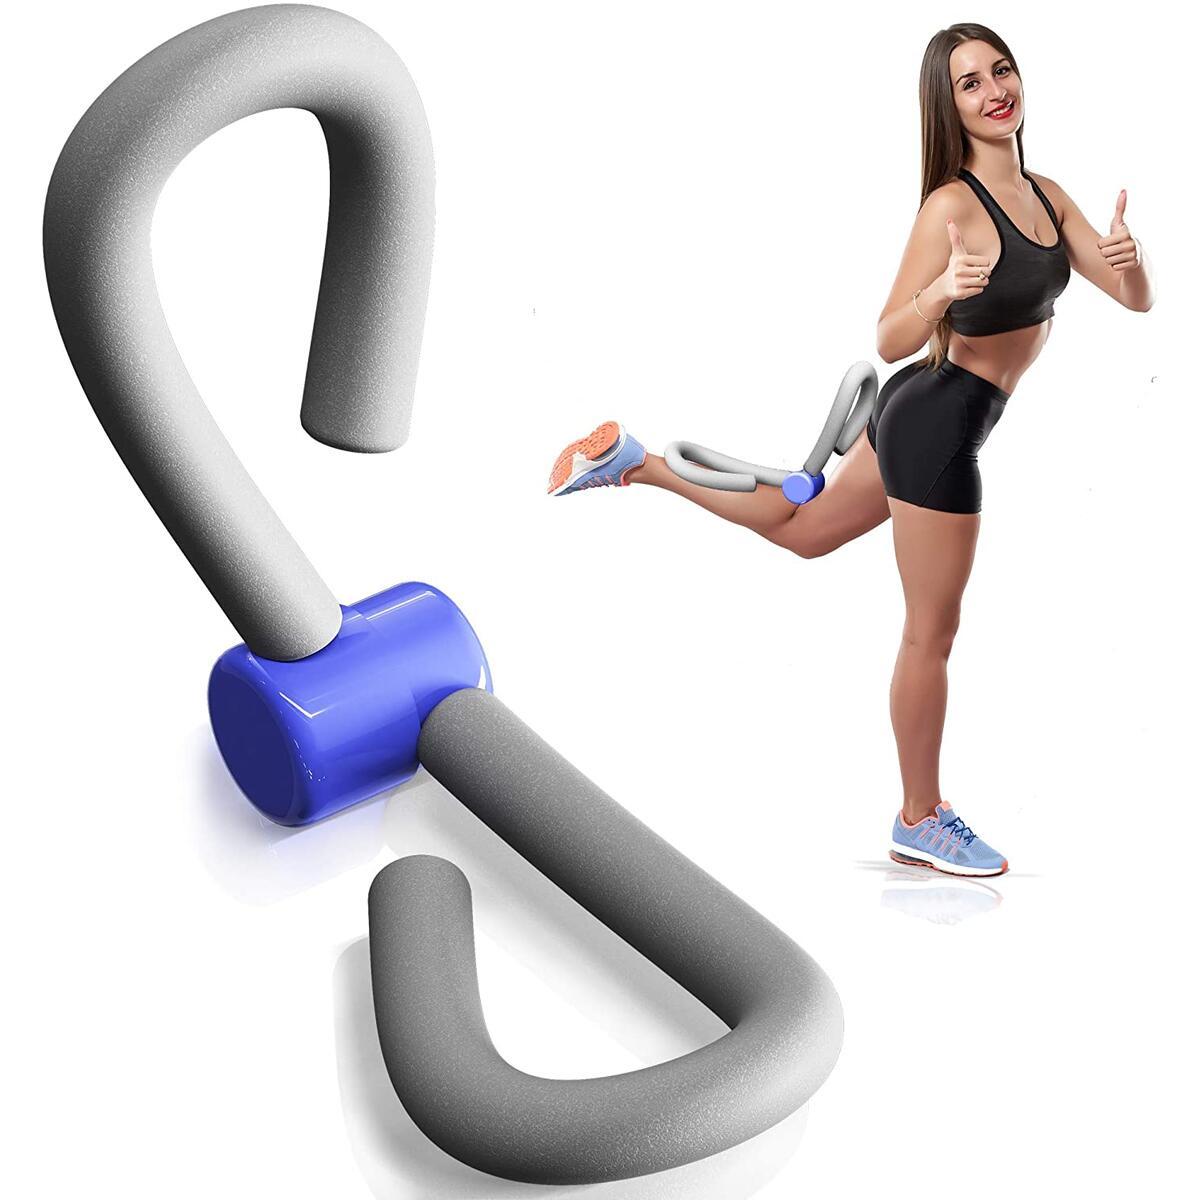 Thigh Master Yoga Pilates Strength Training